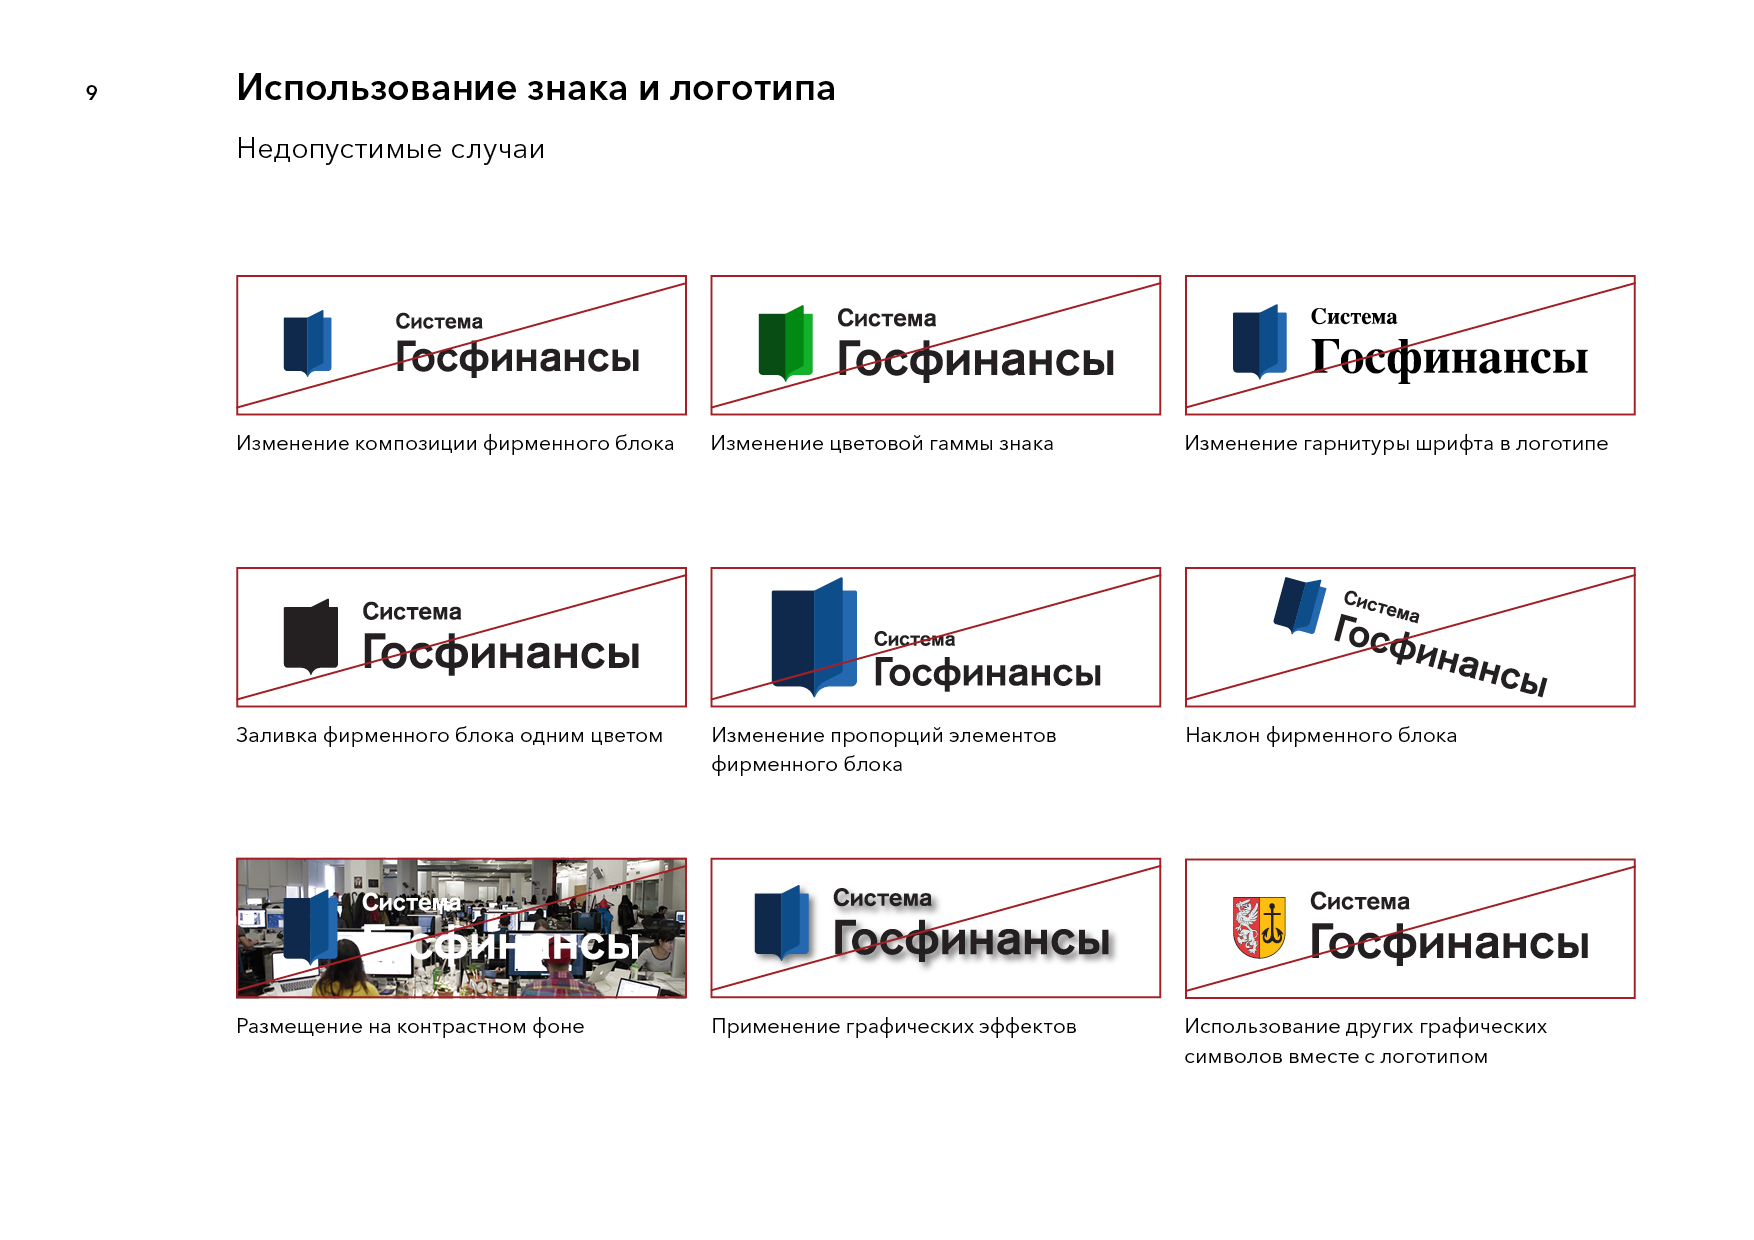 Gosfinansy_guidelines_update_30_0610.jpg